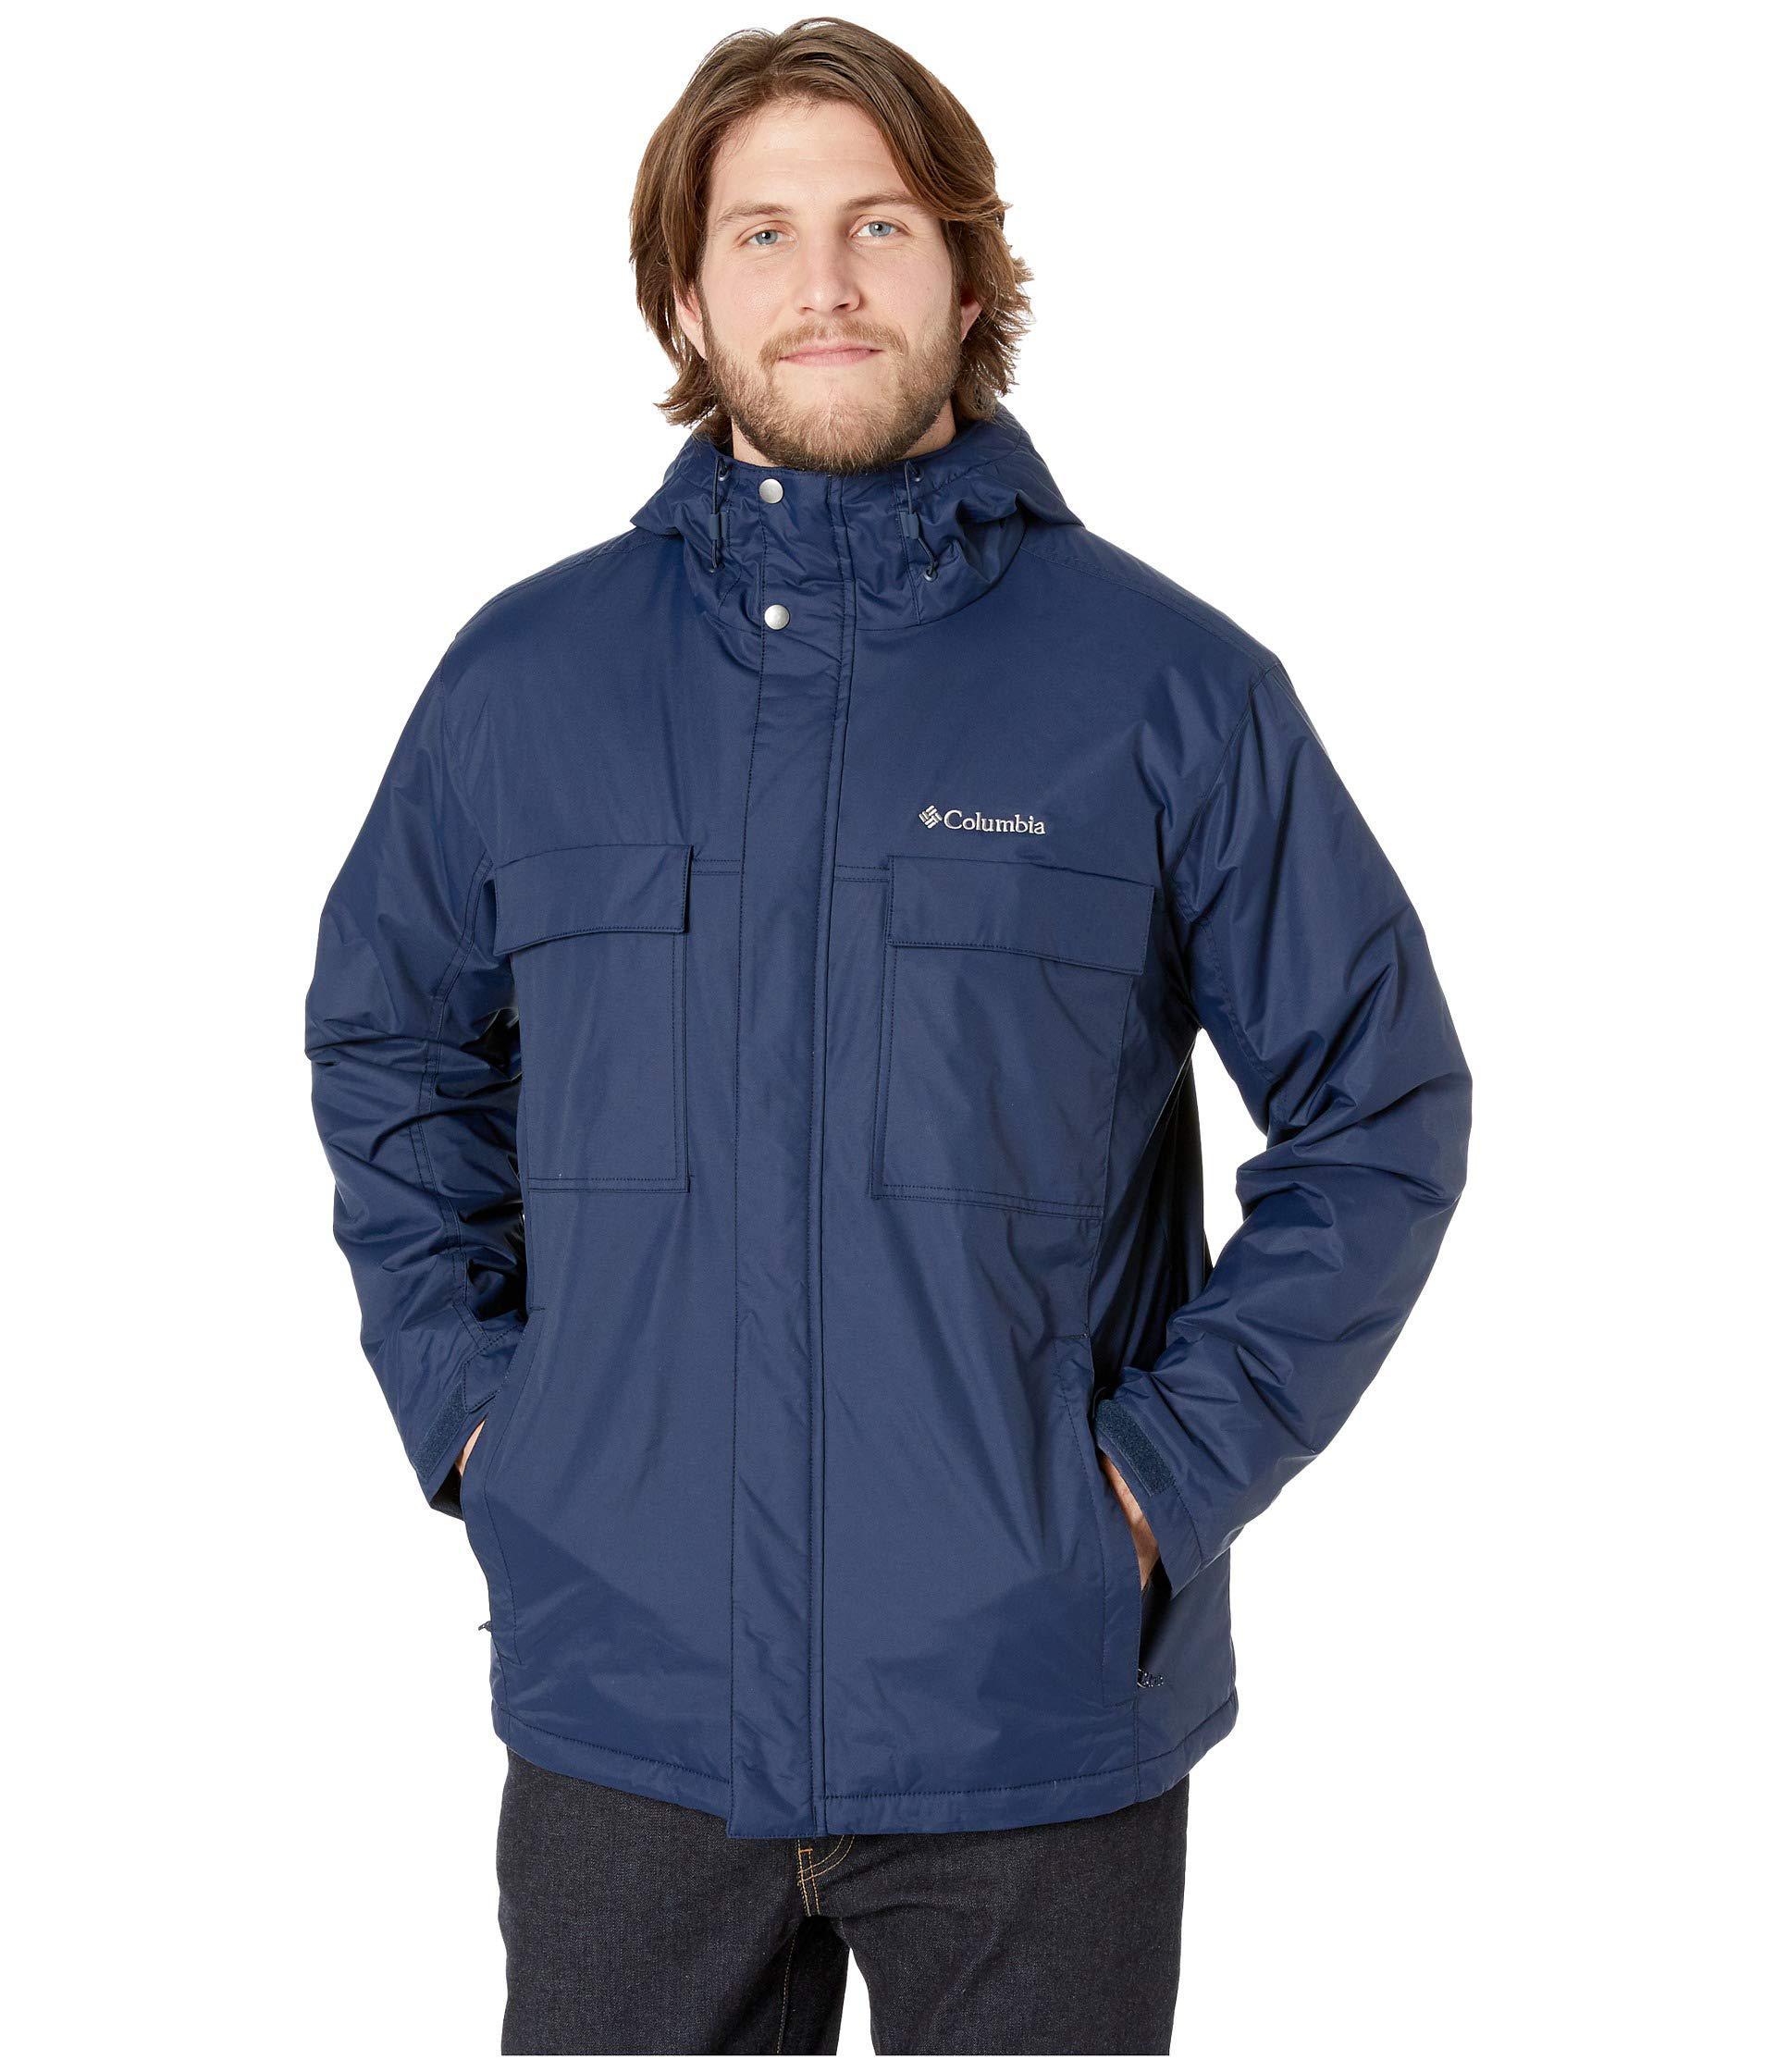 0bc297555 Columbia Big & Tall Ten Fallstm Jacket in Blue for Men - Lyst